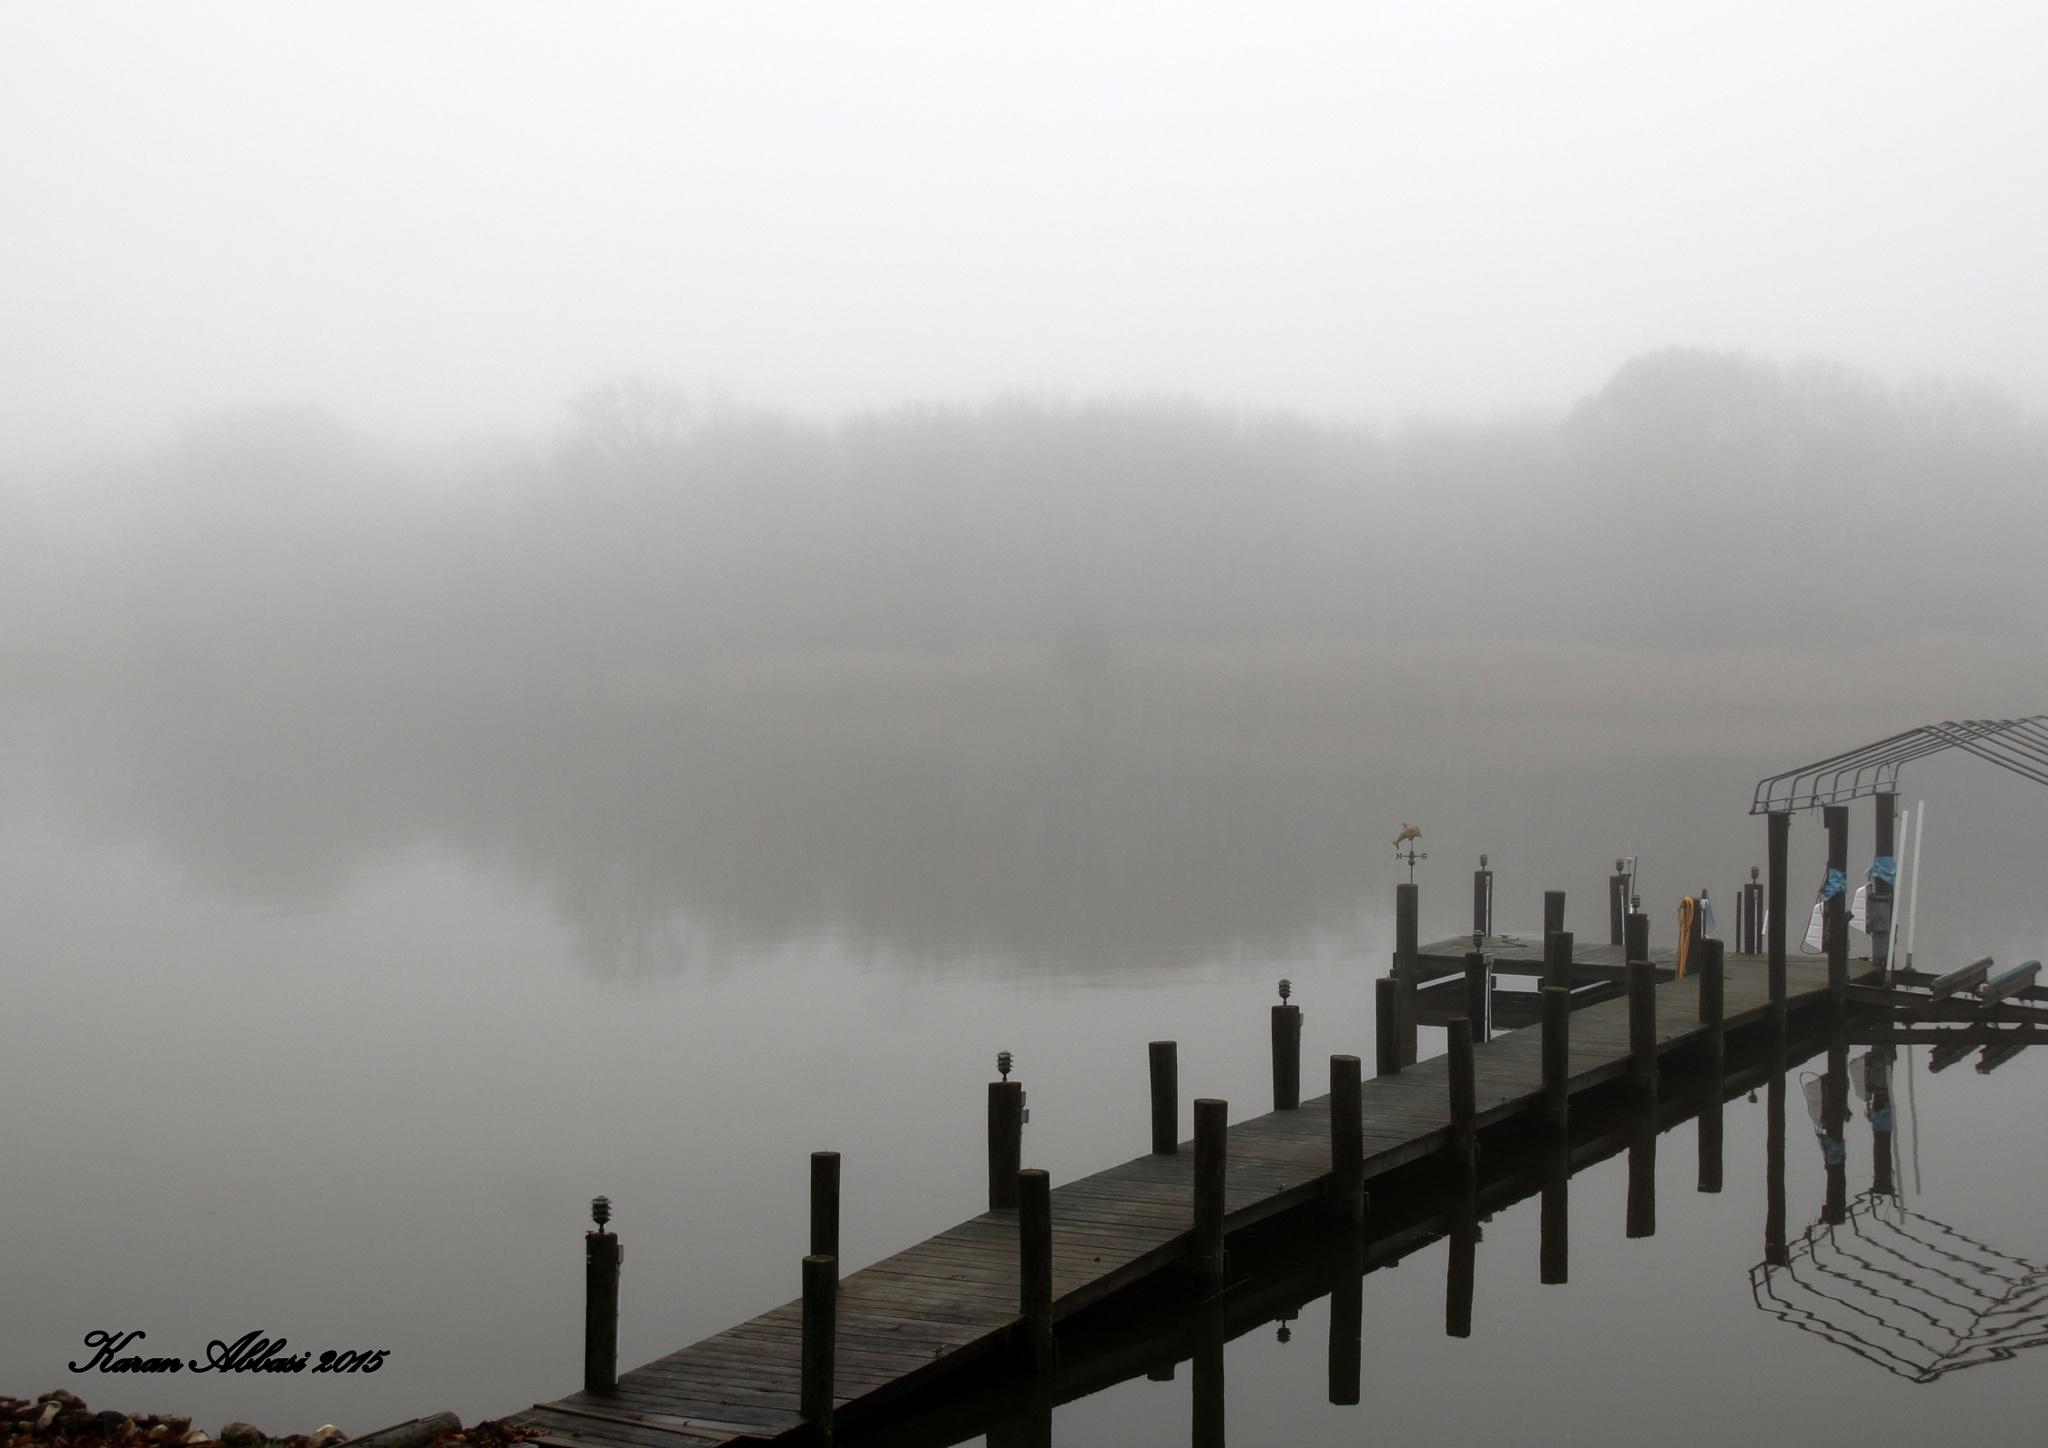 A Bit Foggy, Don't Ya Think? by Purely Inspired by Karan